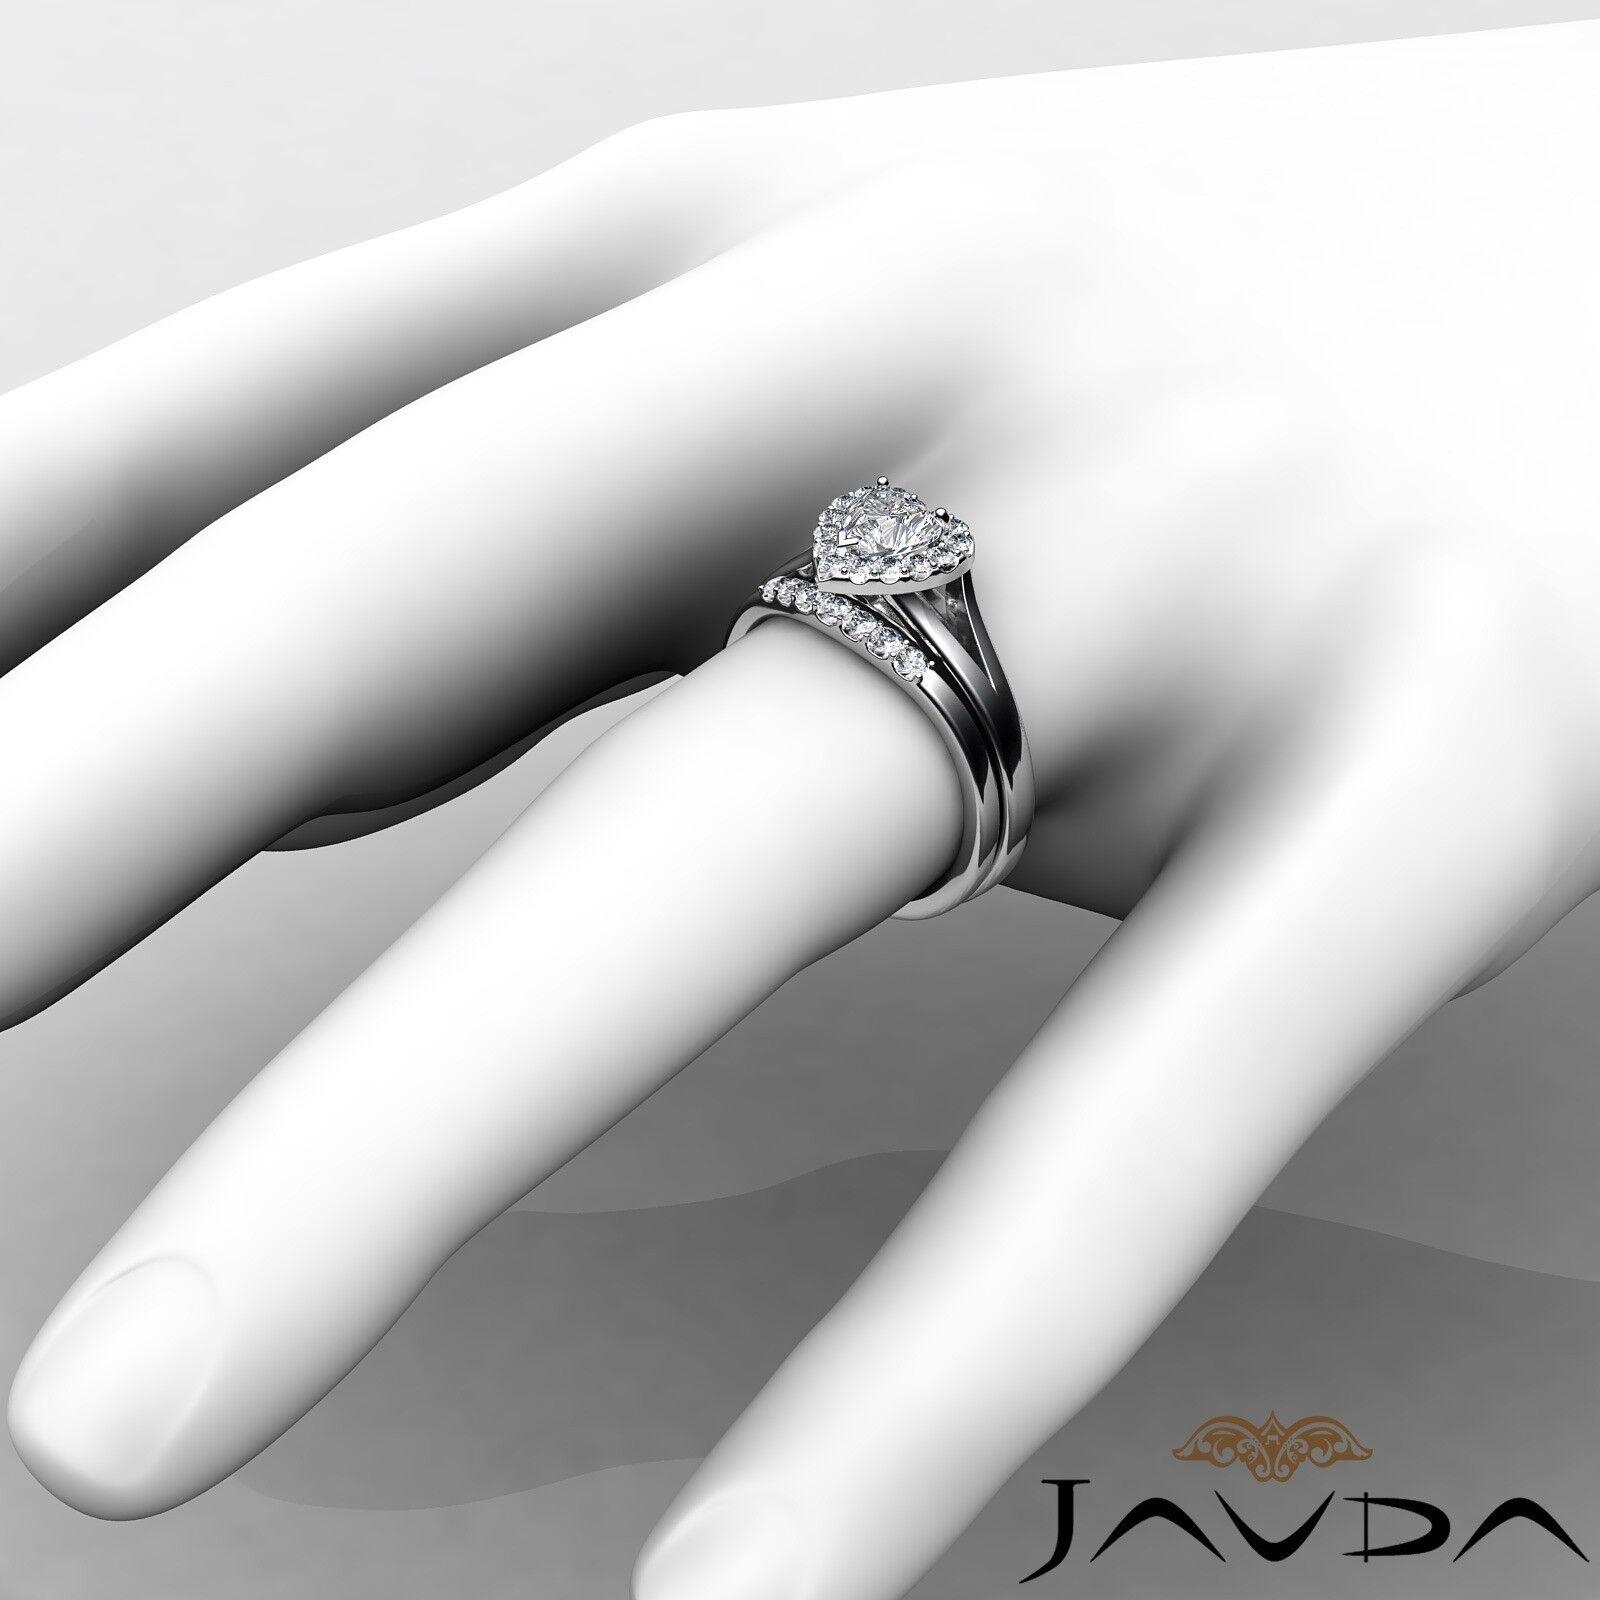 1.22ctw Pave Halo Bridal Set Heart Diamond Engagement Ring GIA G-VVS2 White Gold 4